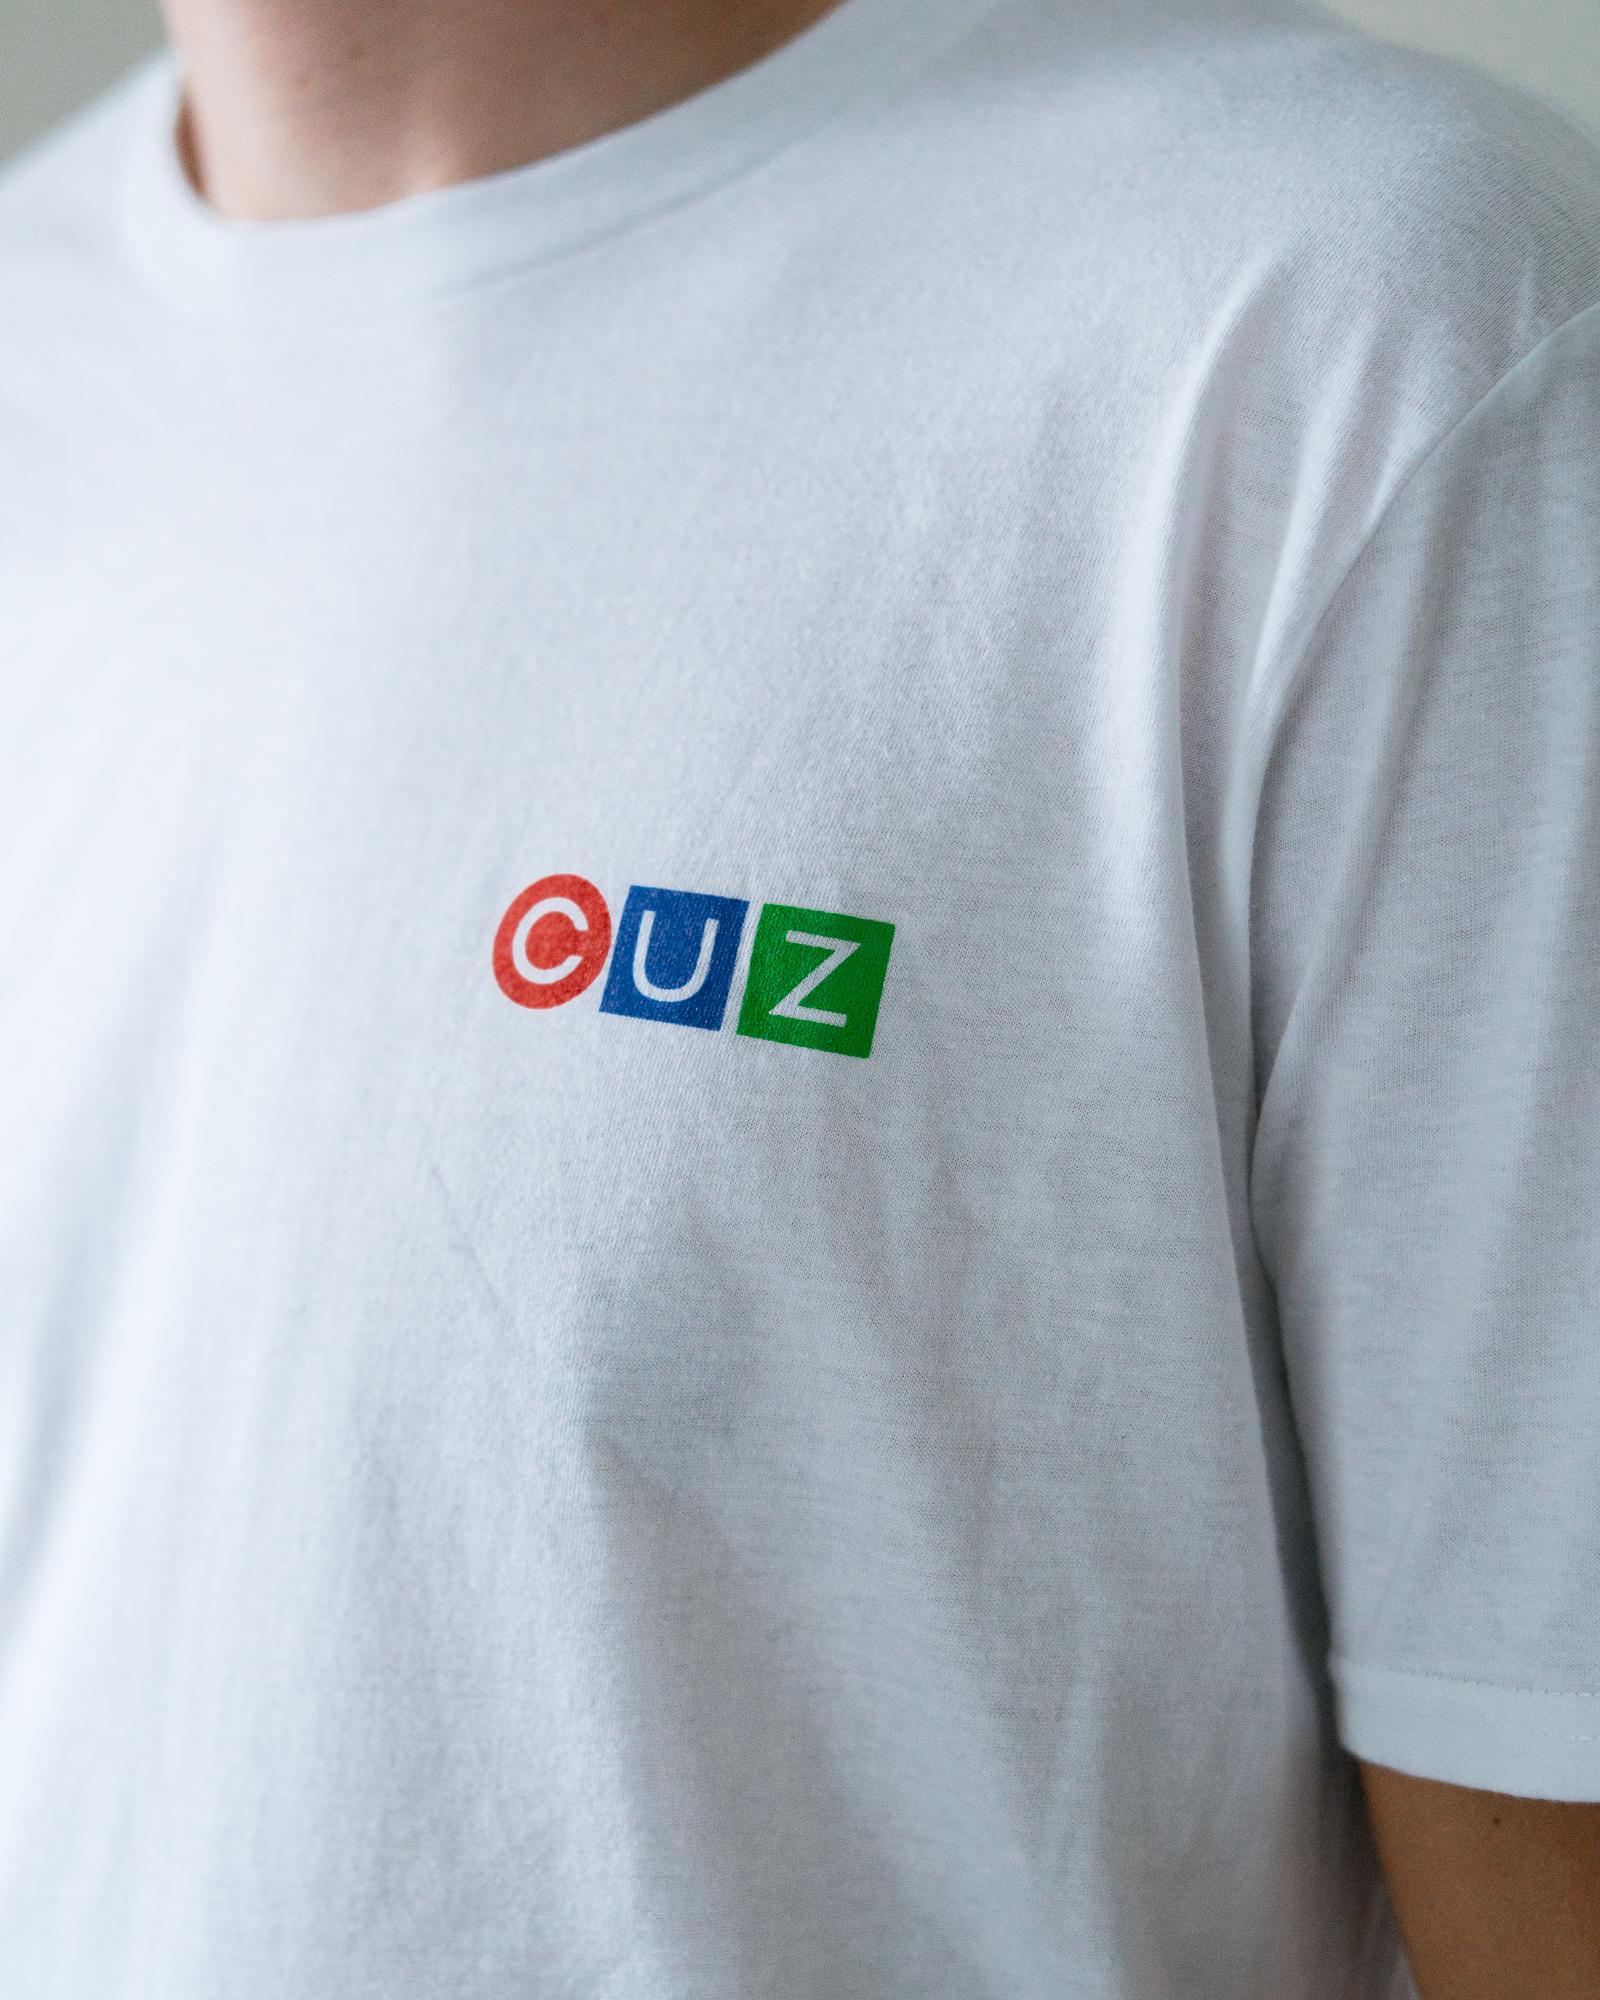 cuzband-ctvphotos-8